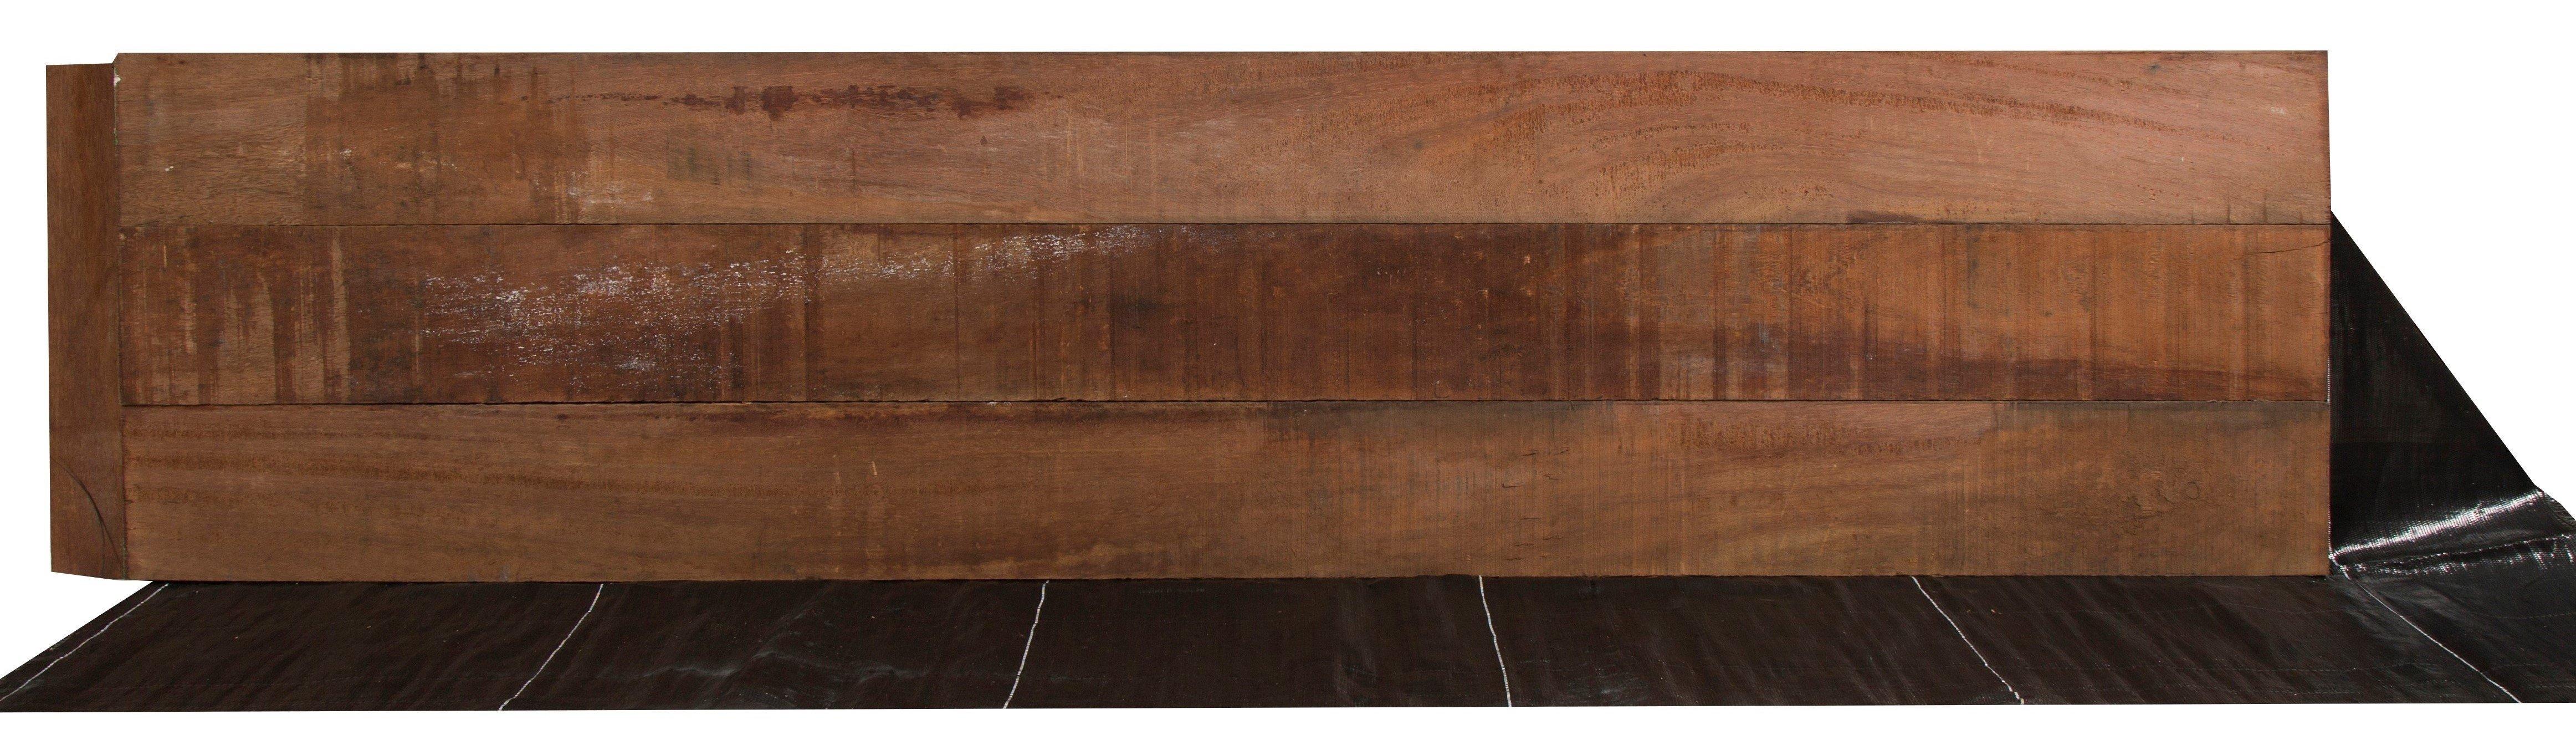 Houten Beschoeingsschotten 80 x 250 cm. Type: Azobe